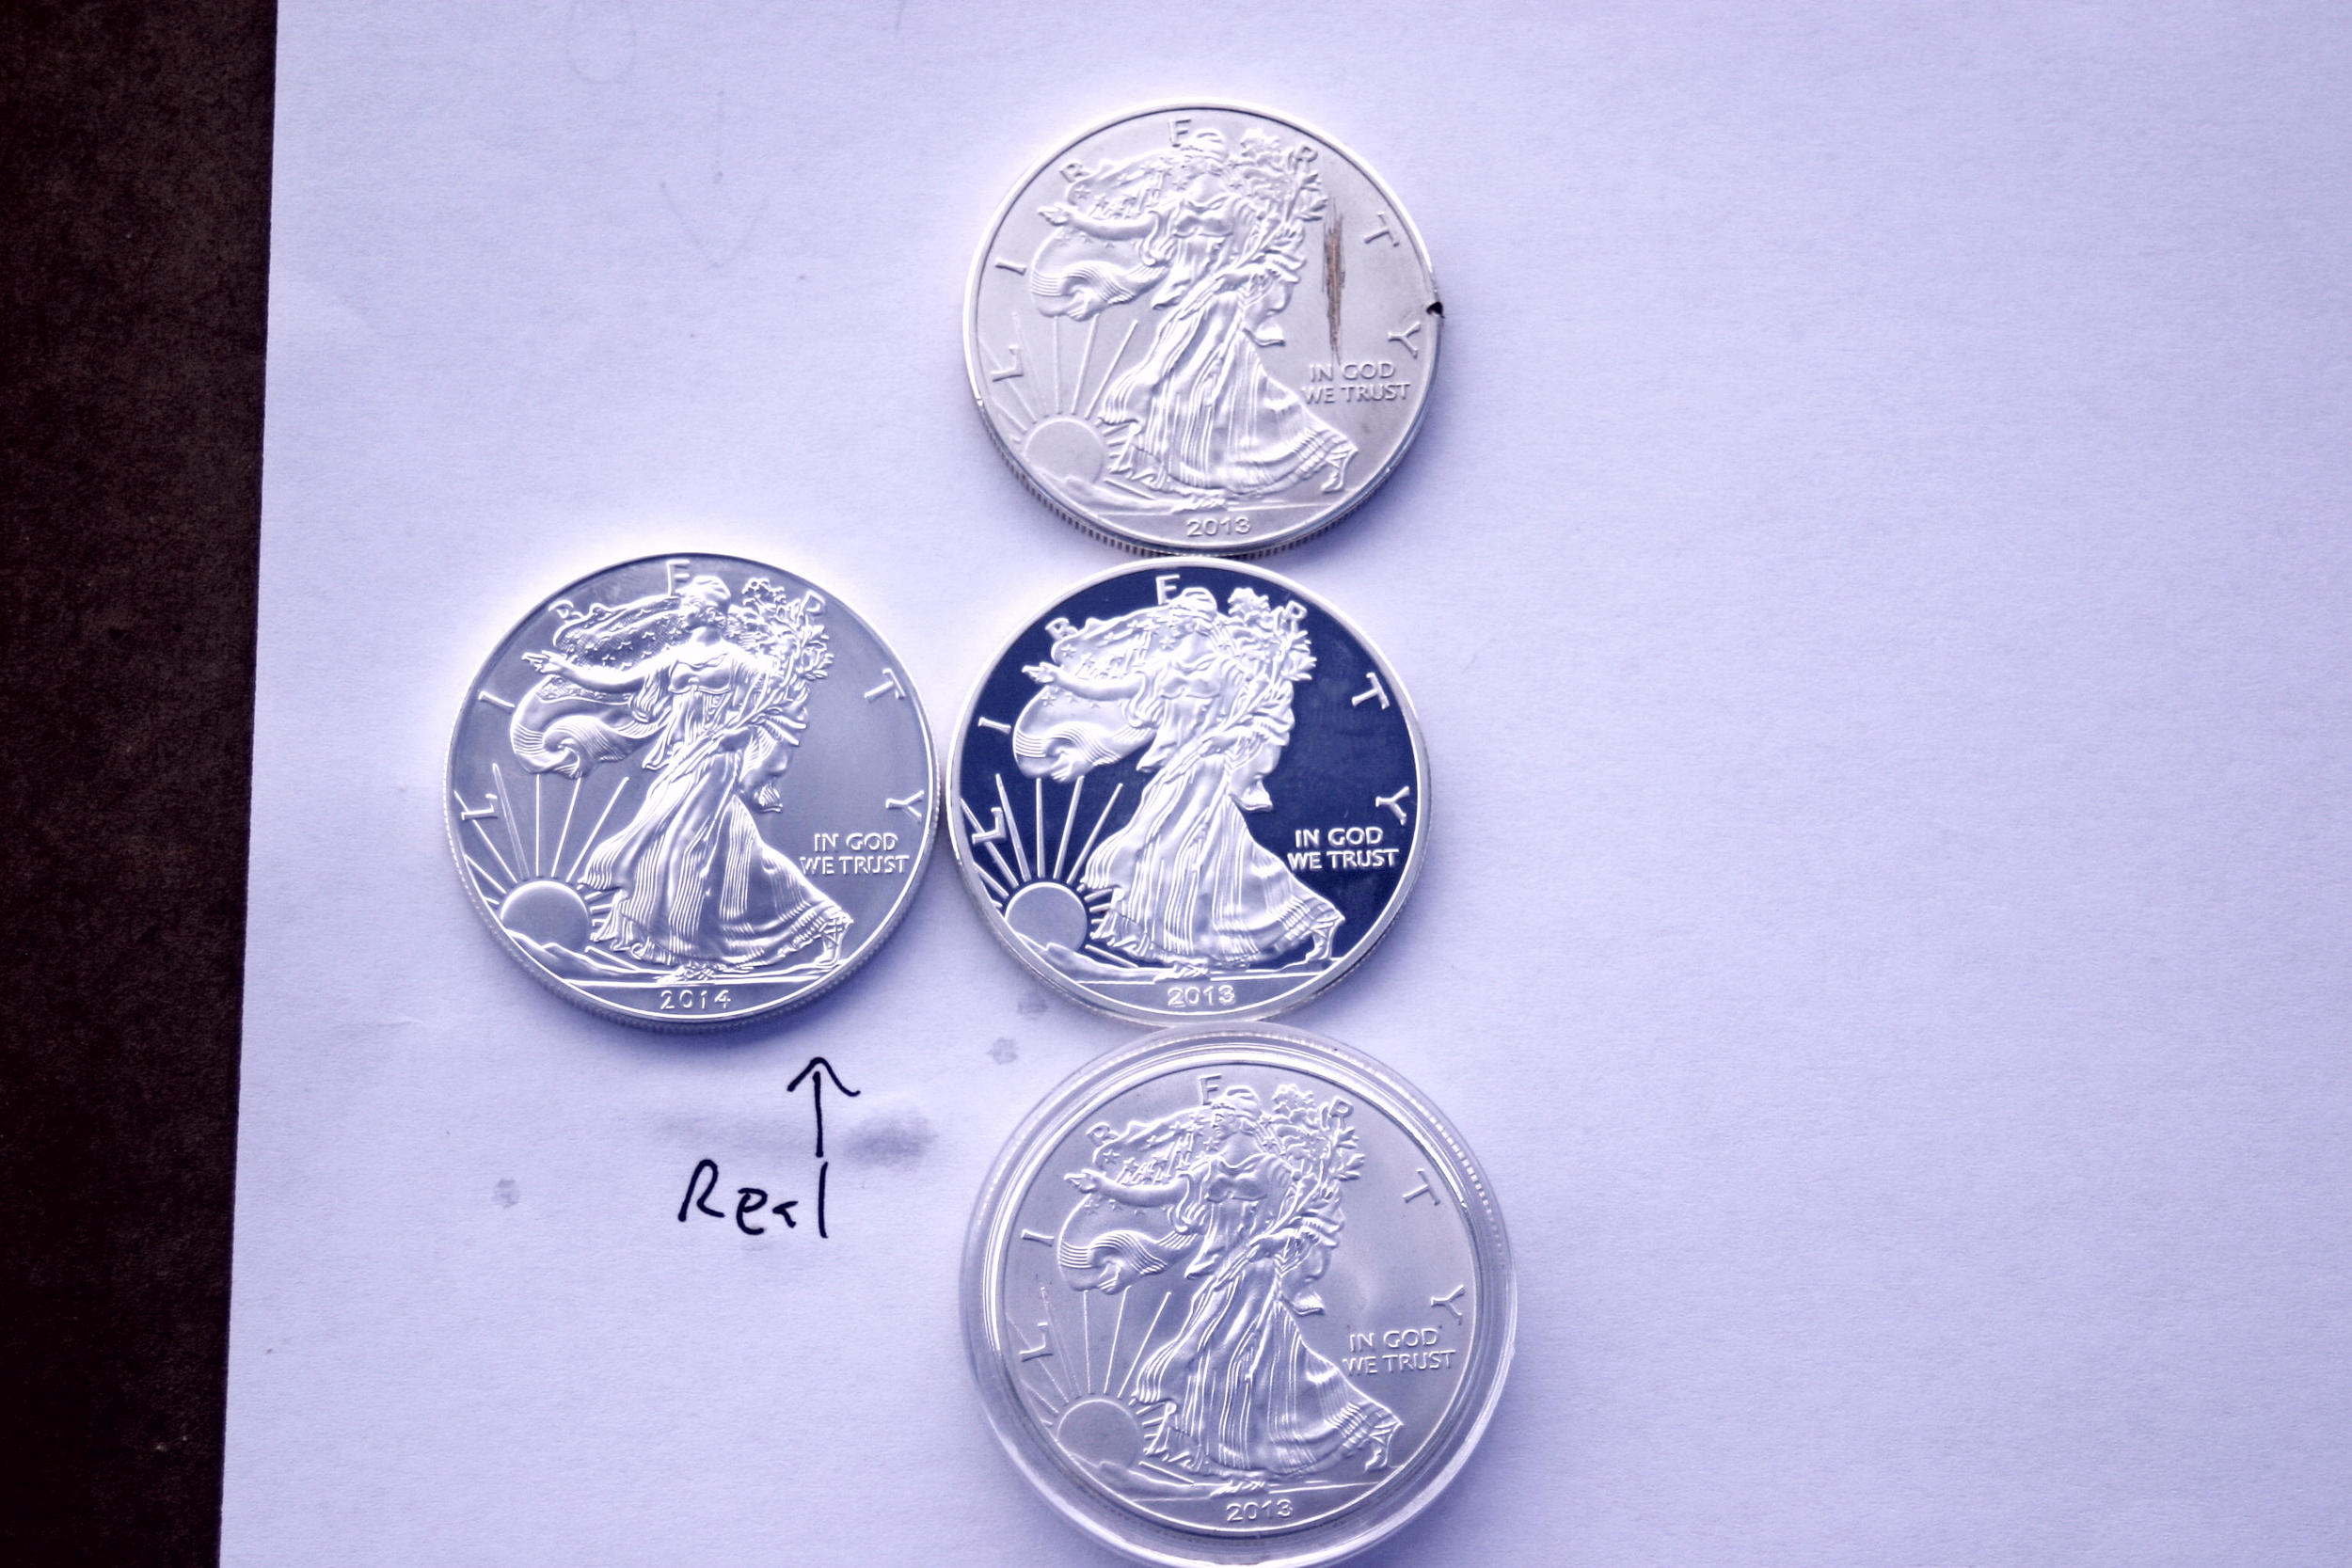 counterfeit american silver eagles.JPG